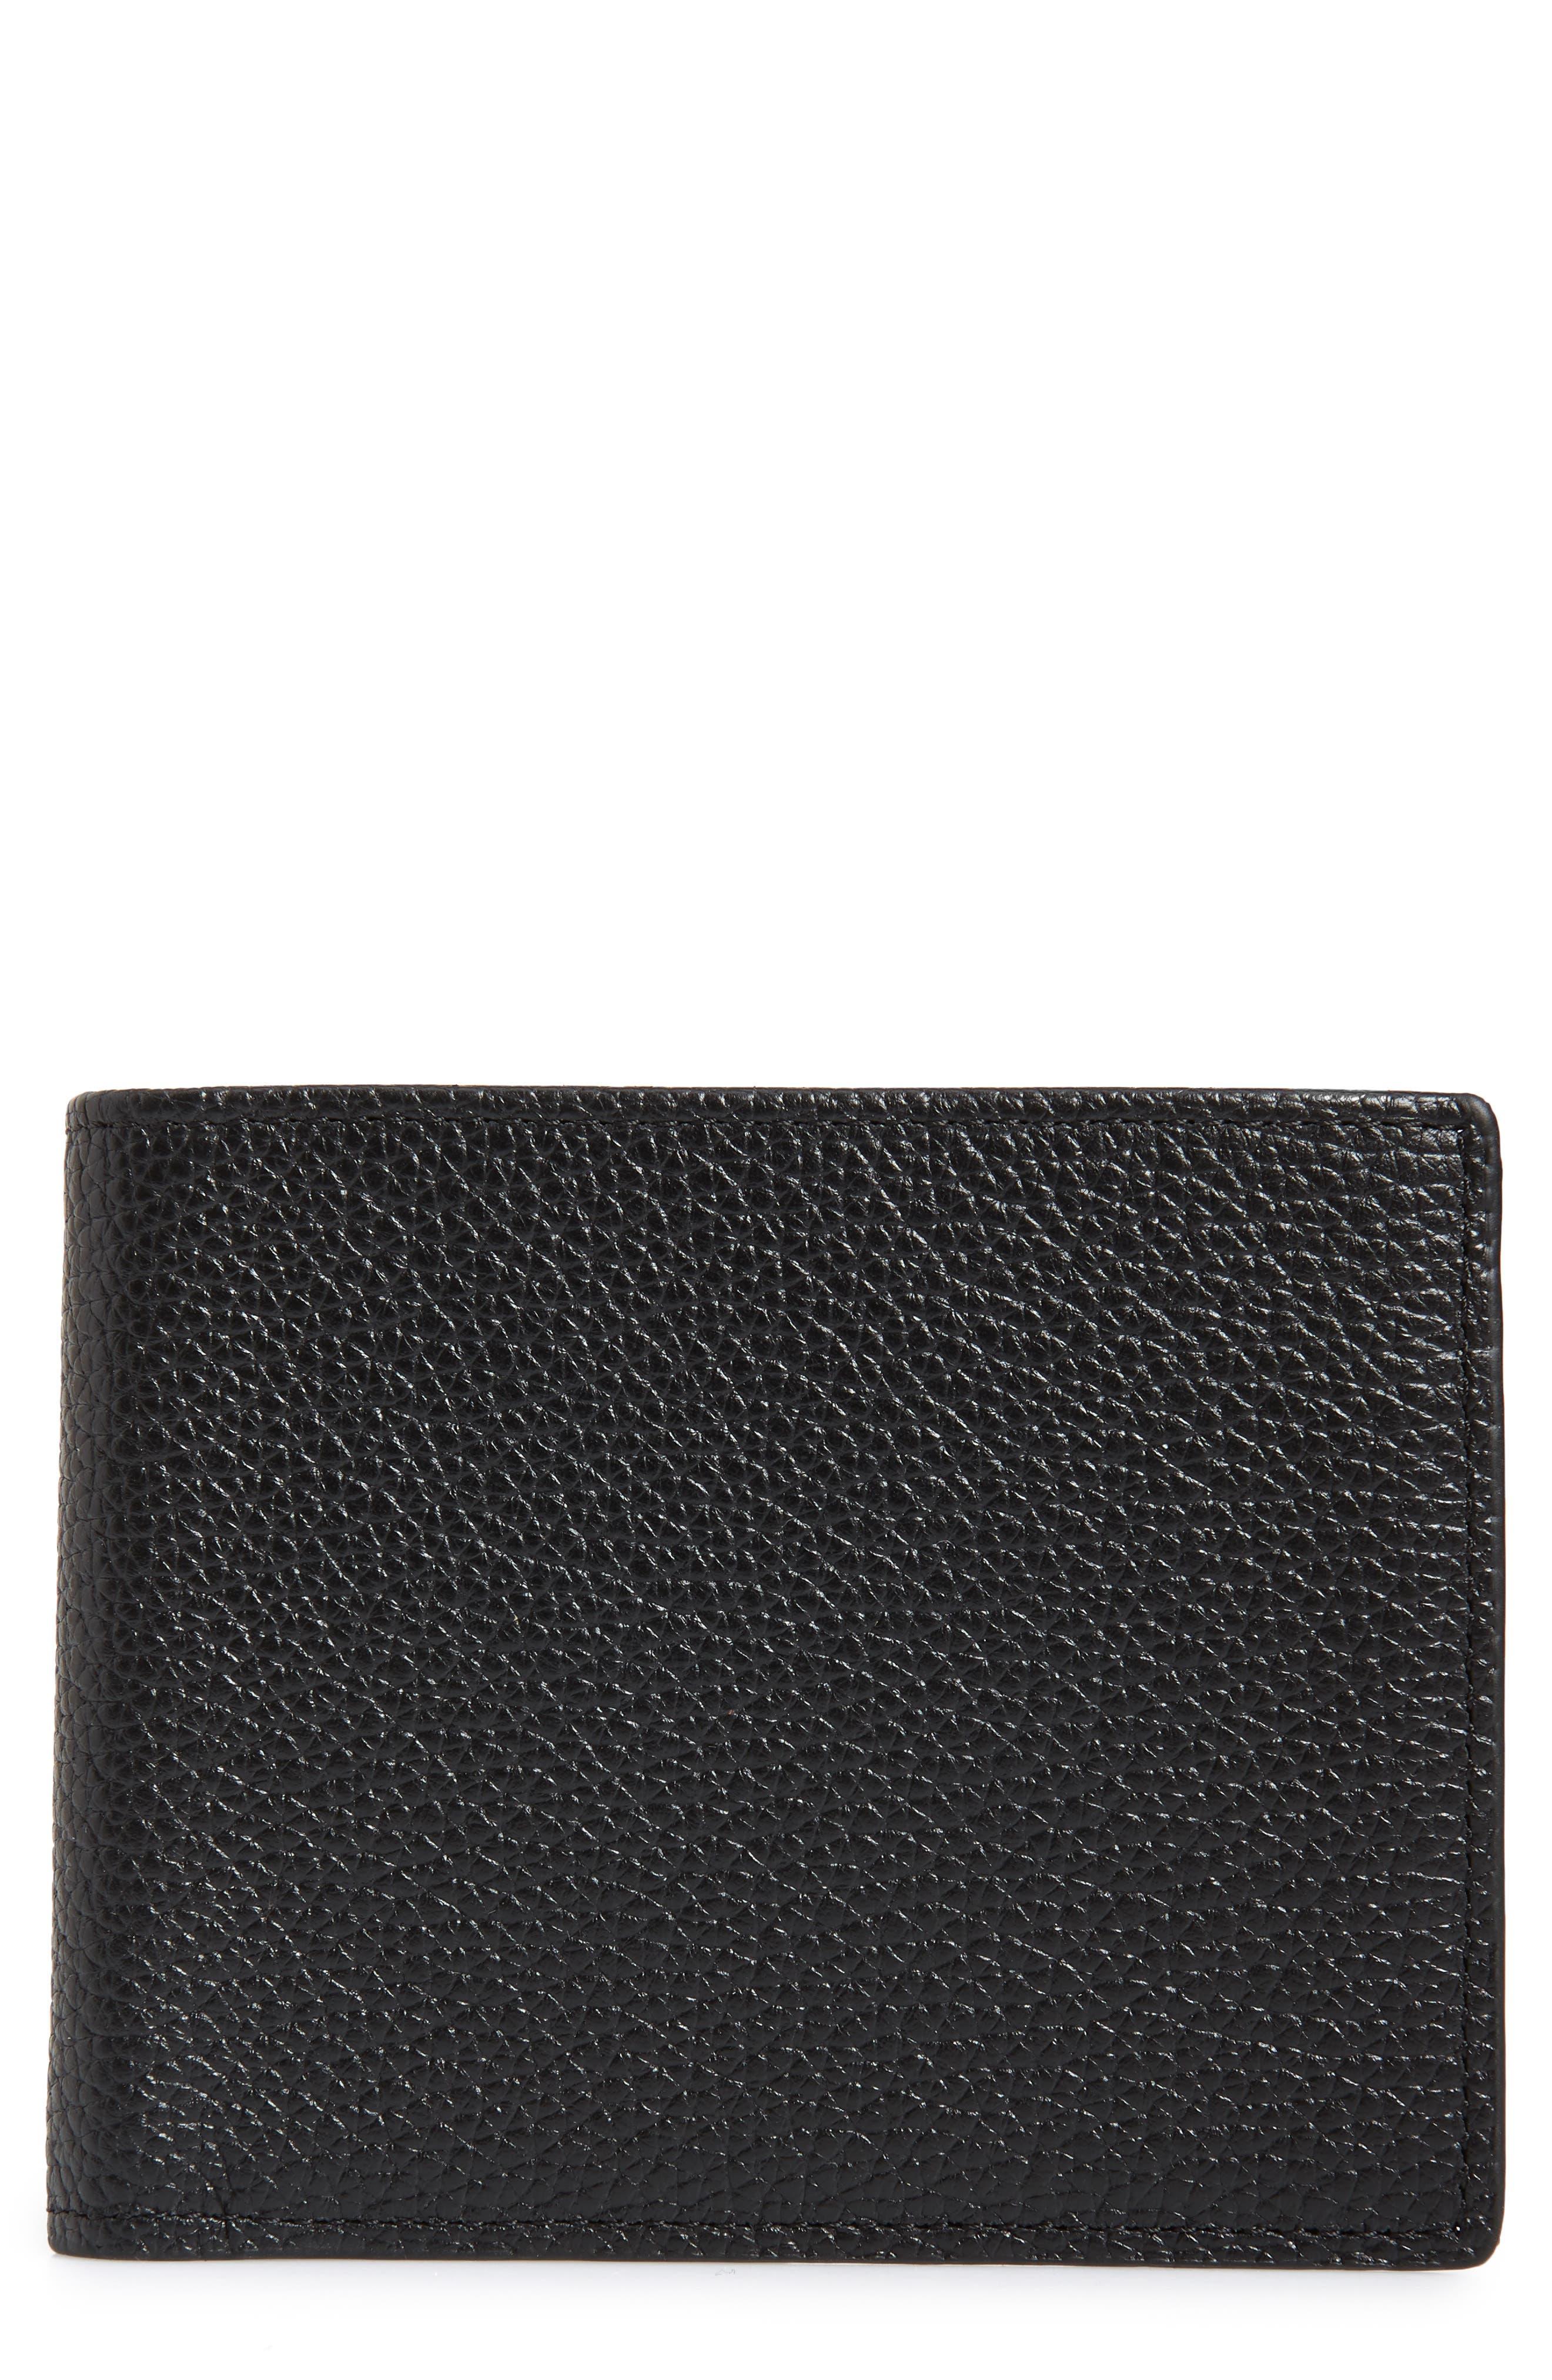 Midland RFID Leather Wallet,                             Main thumbnail 1, color,                             BLACK